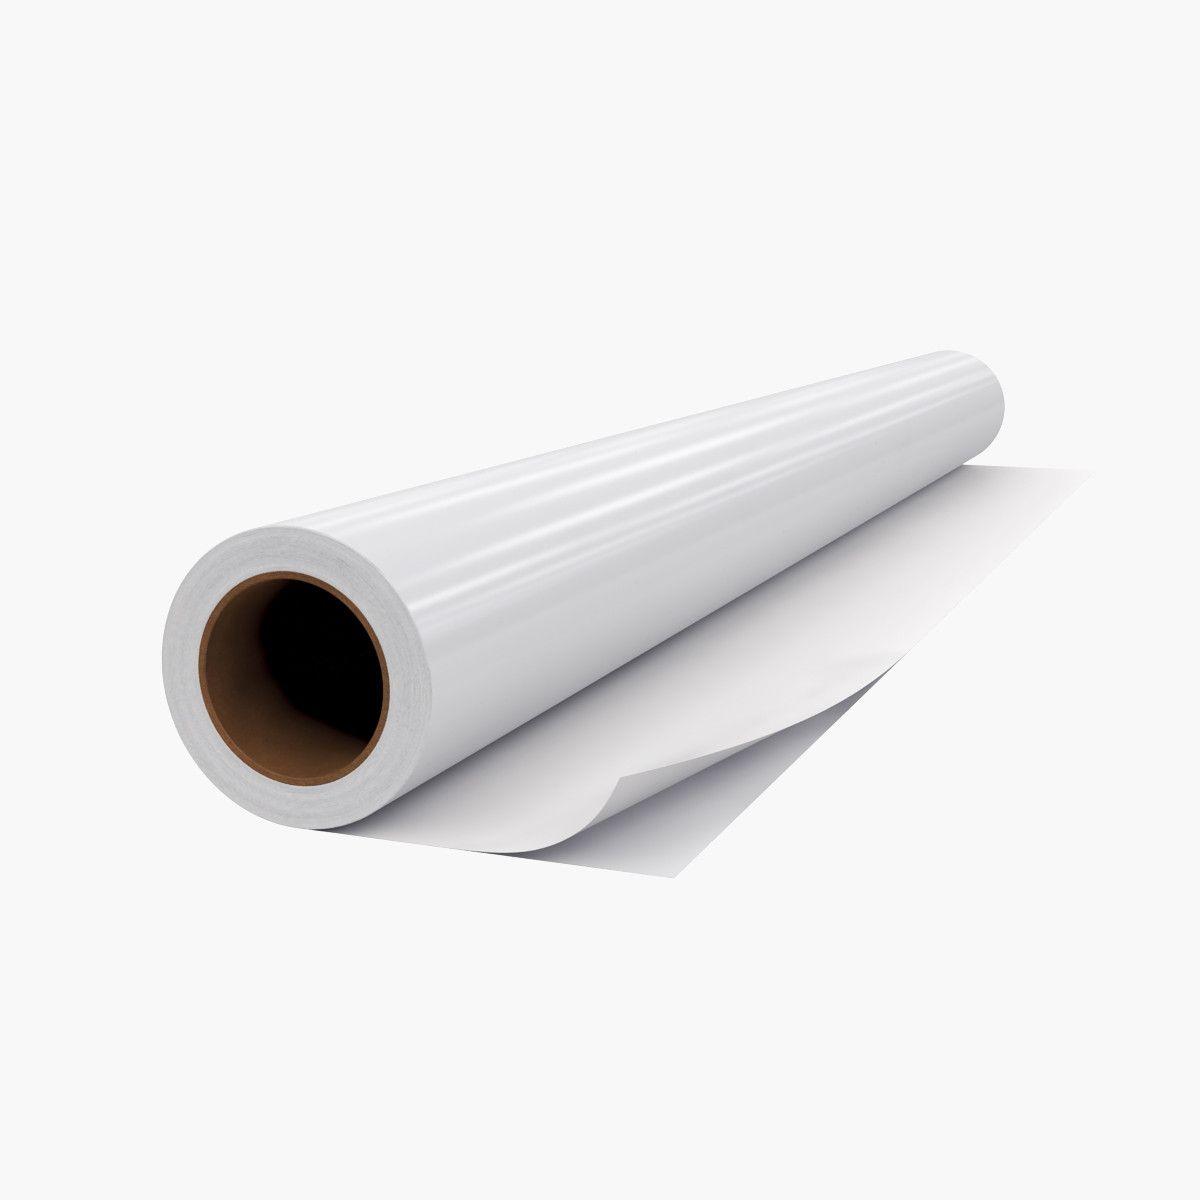 Sublitex Tecido Chinelo + Pelicula Premium 10mts X 46cm Cada